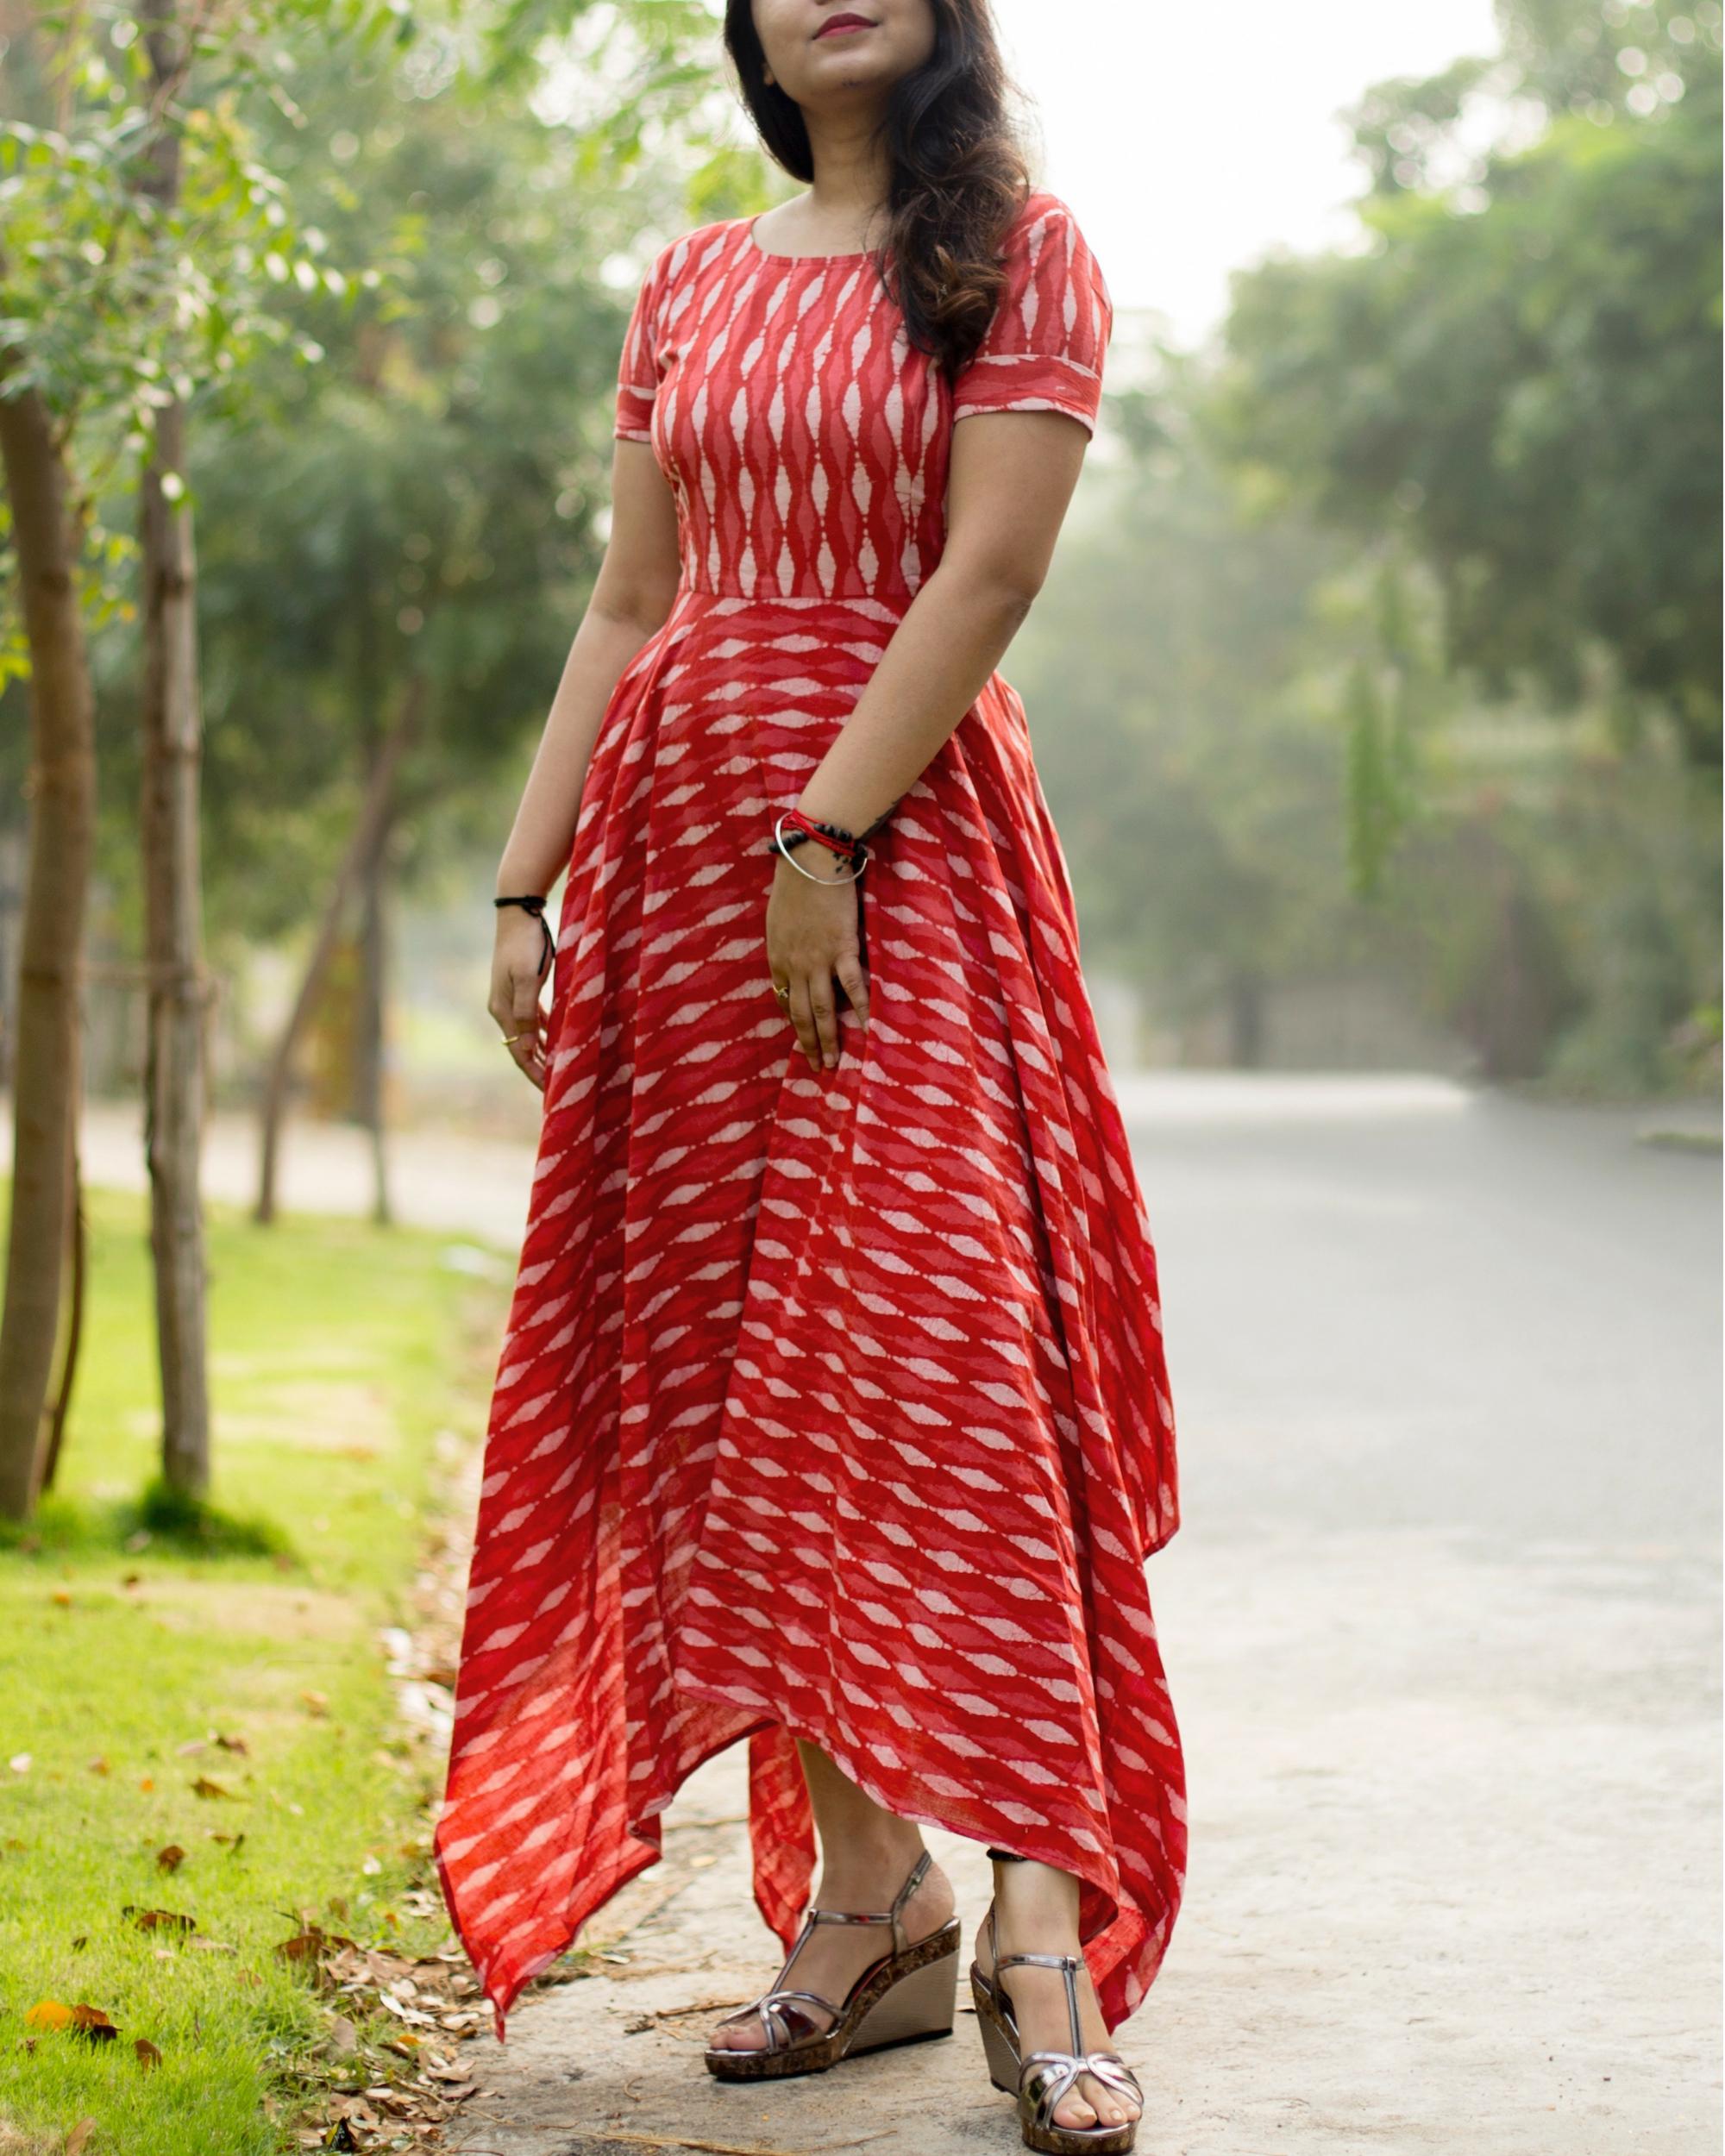 Red asymmetric dress